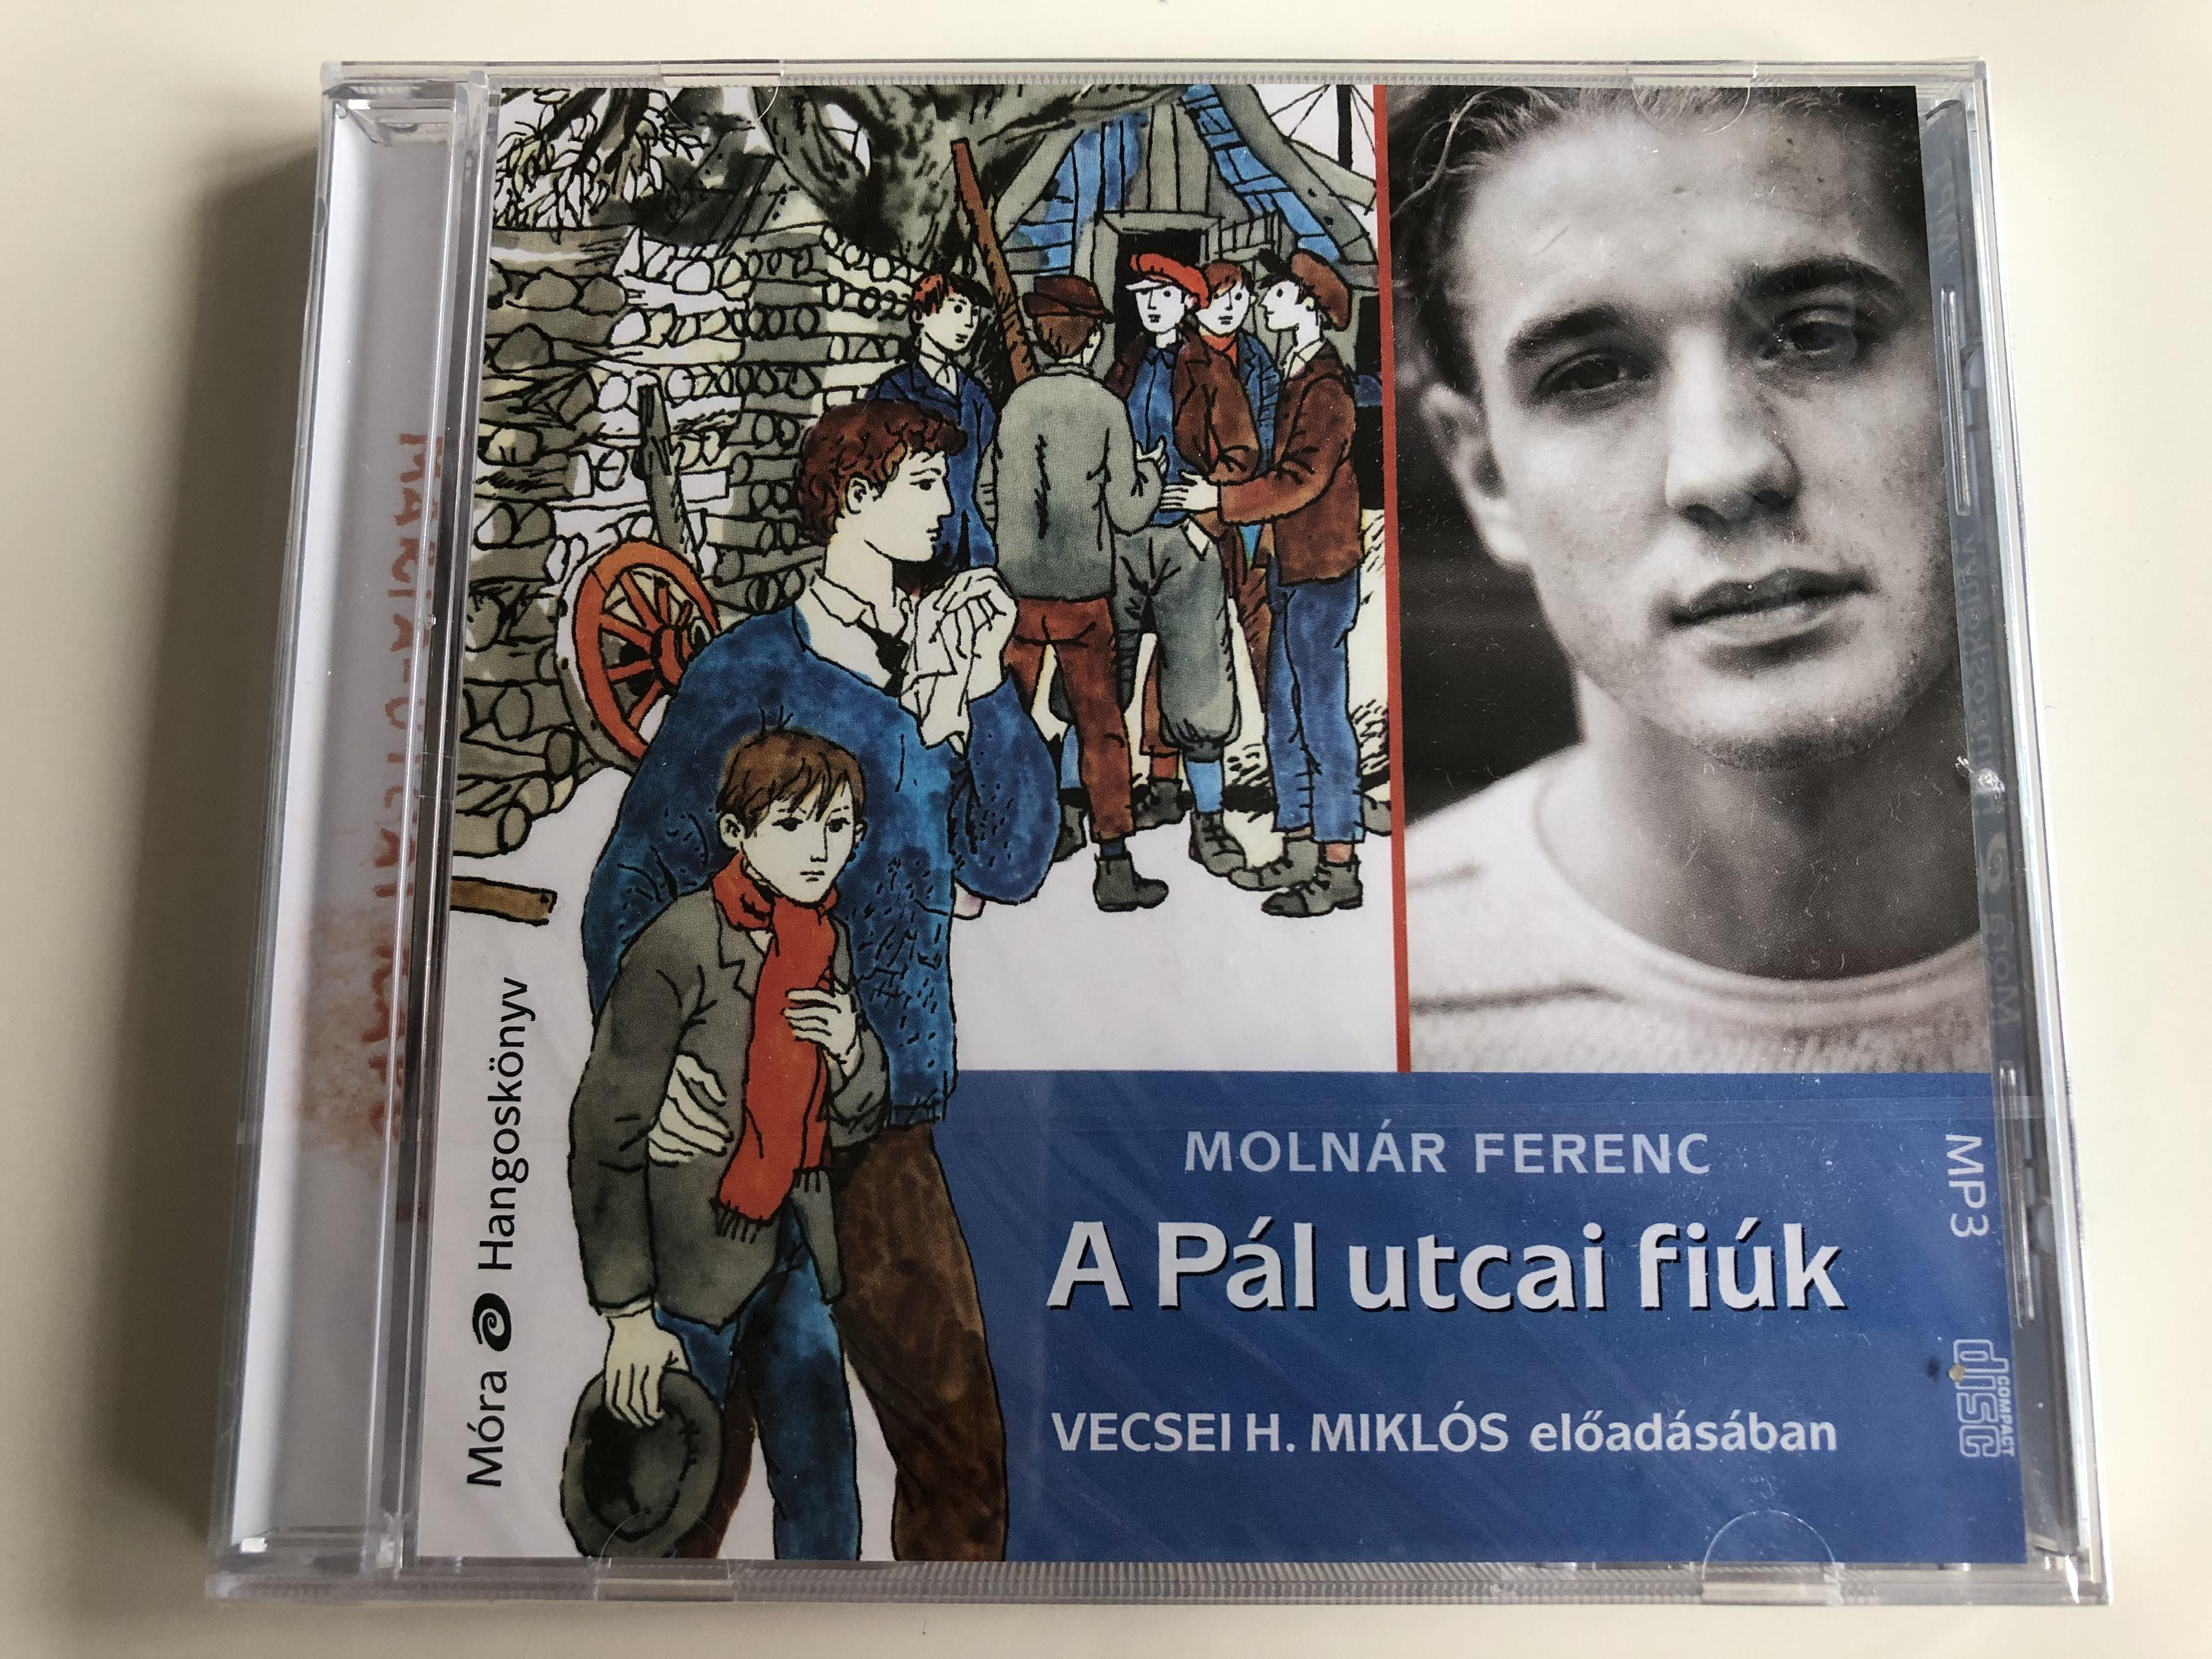 molar-ferenc-a-pal-utcai-fiuk-vecsei-h.-miklos-eloadasaban-mora-konyvkiado-audio-cd-2020-97896348638167-1-.jpg